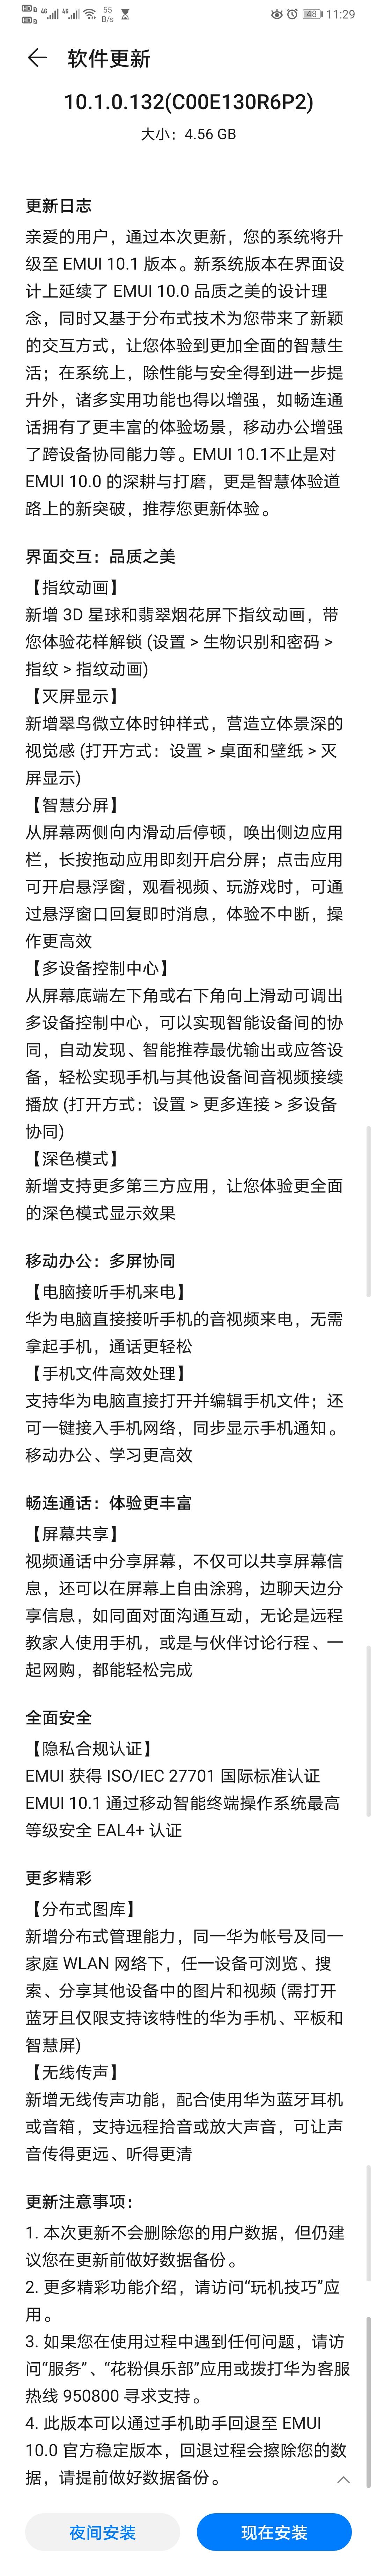 Screenshot_20200517_112918_com.huawei.android.hwouc.jpg